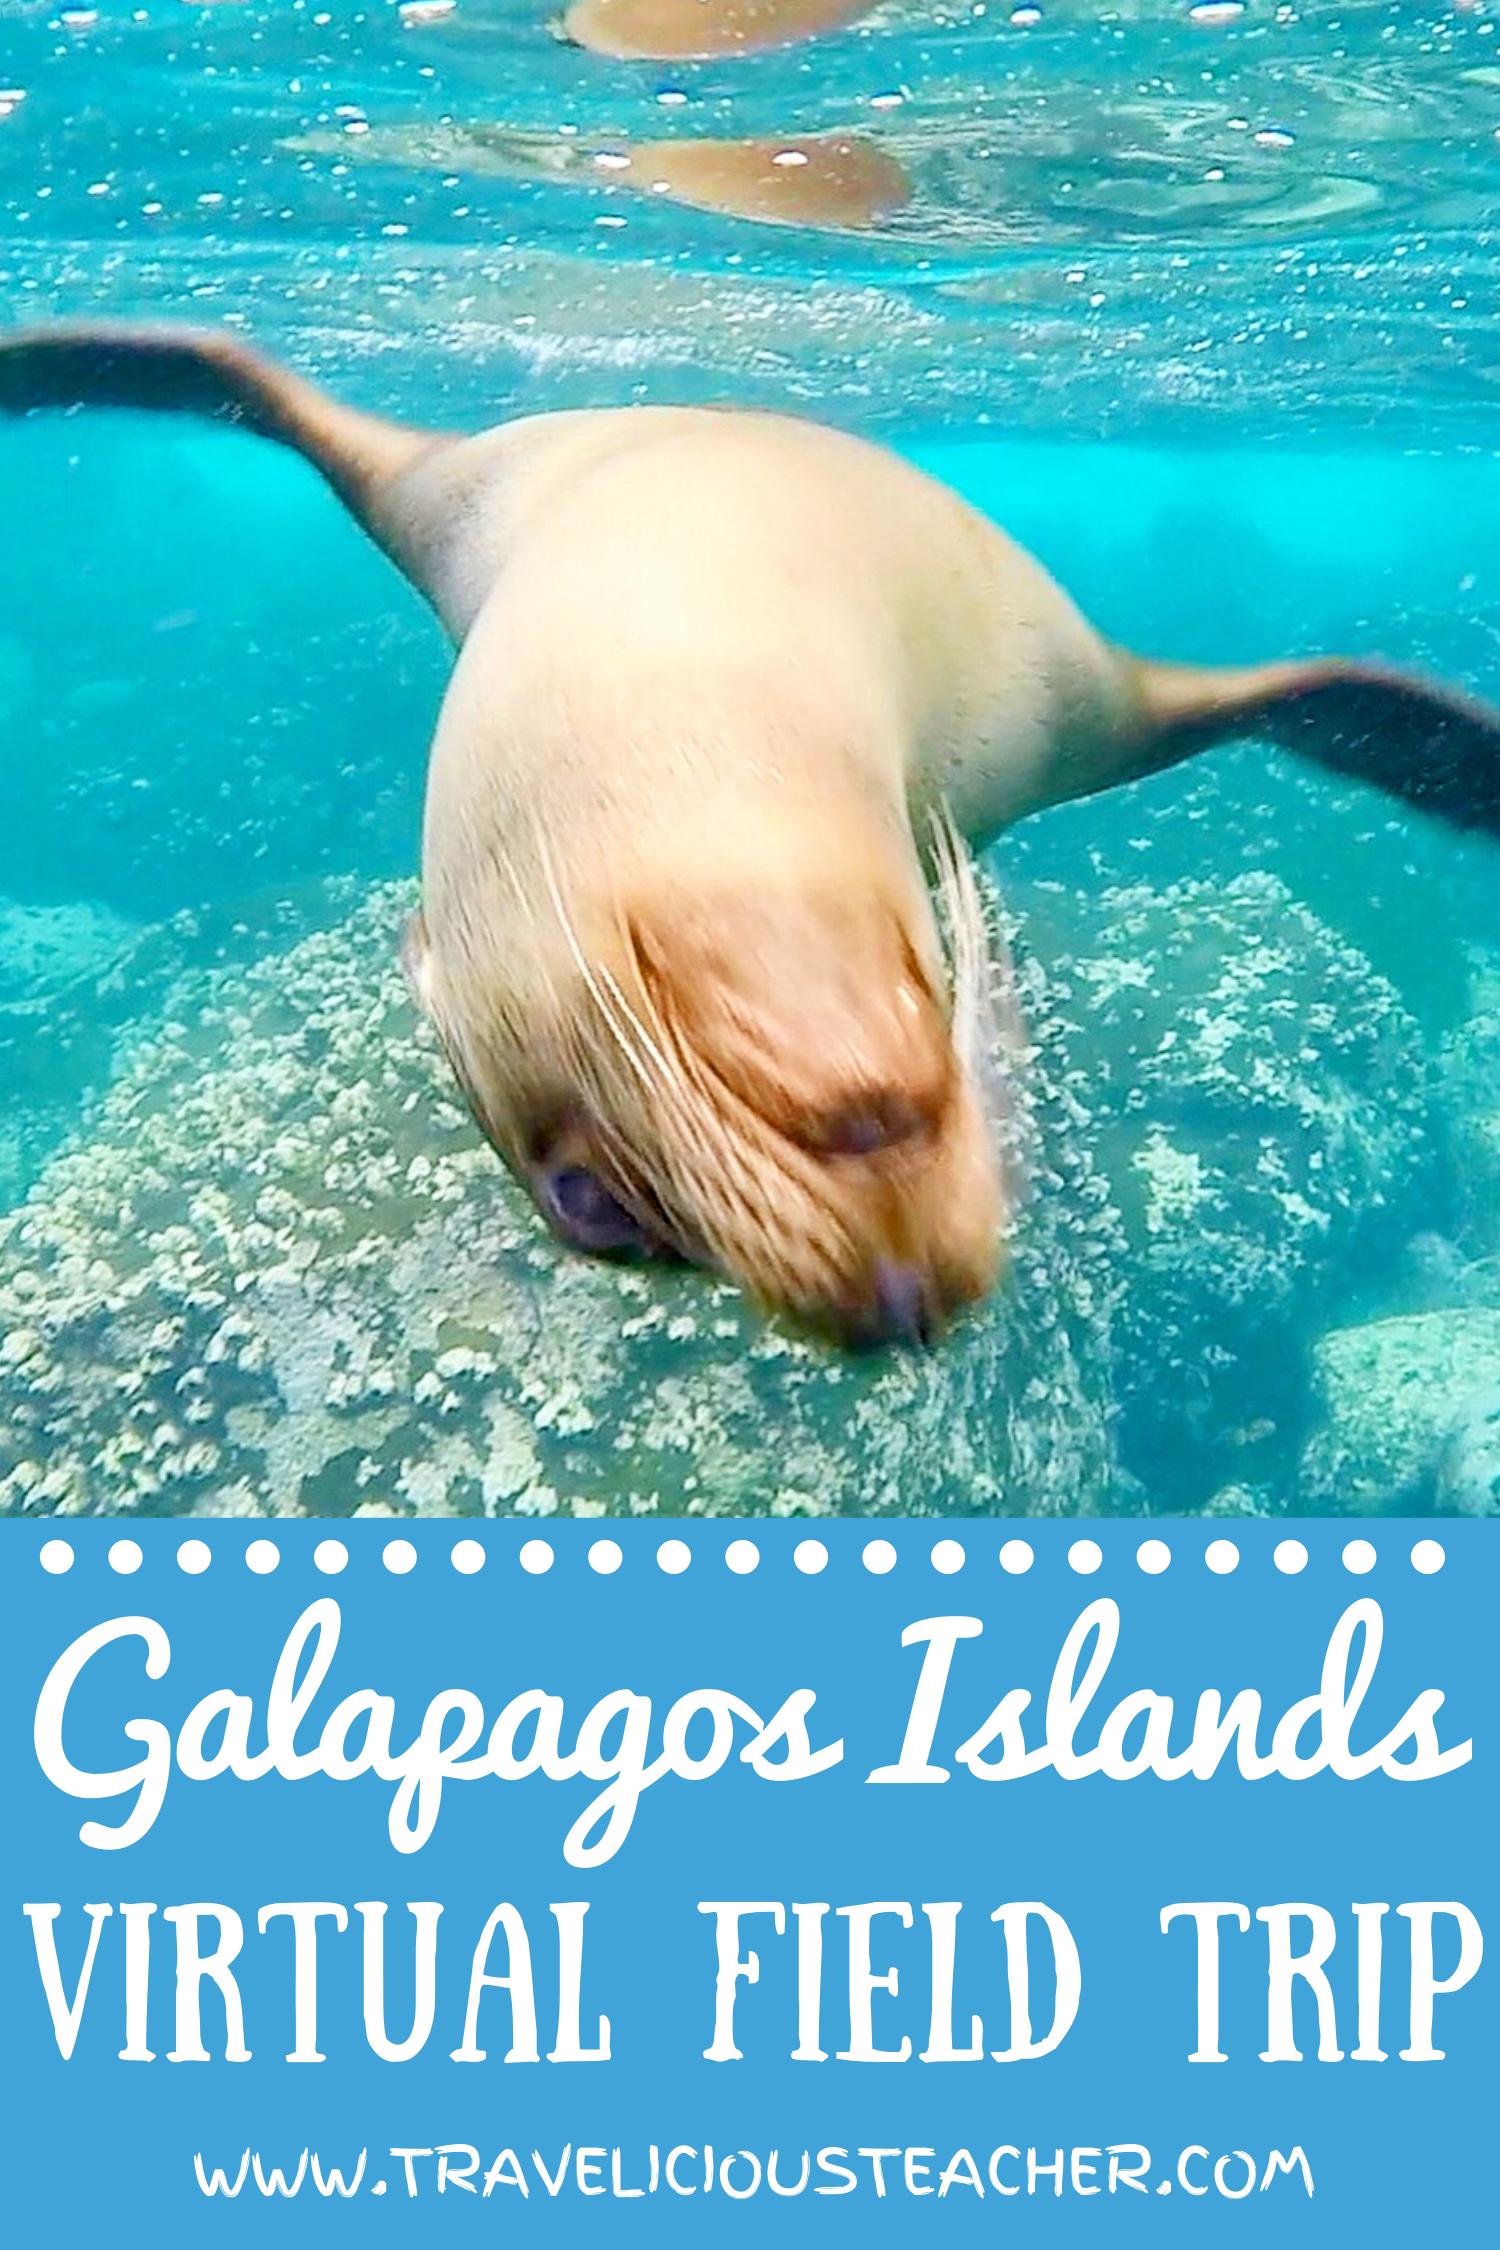 Virtual Field Trip Galapagos Islands Virtual Field Trips Field Trip Classroom Field Trip [ 2250 x 1500 Pixel ]